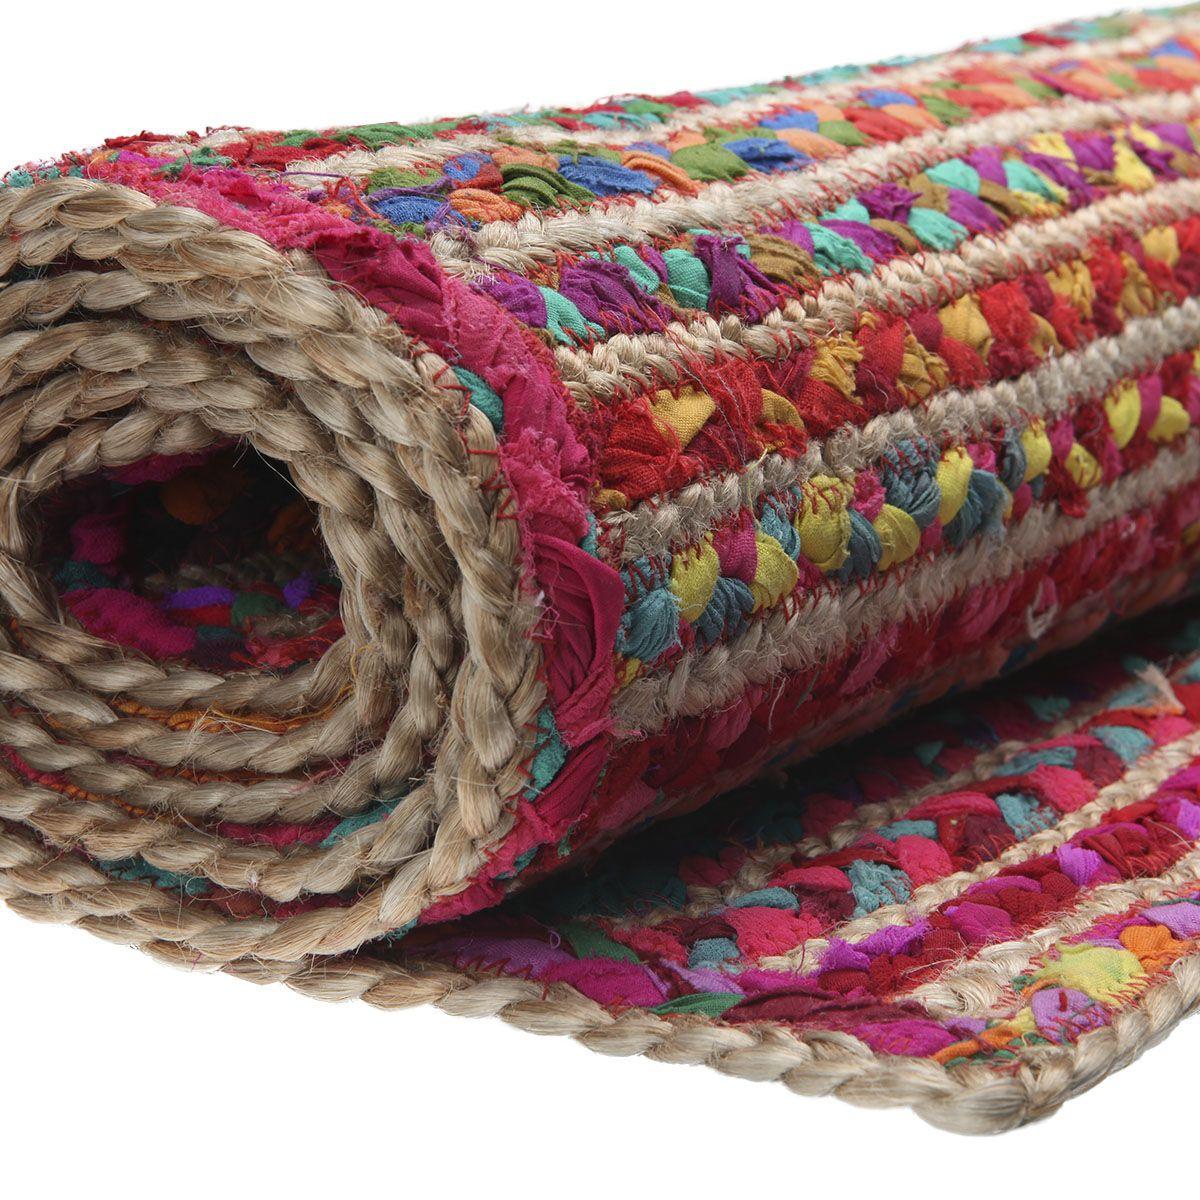 sarah sue teppich colorade upcycling aus stoffresten. Black Bedroom Furniture Sets. Home Design Ideas